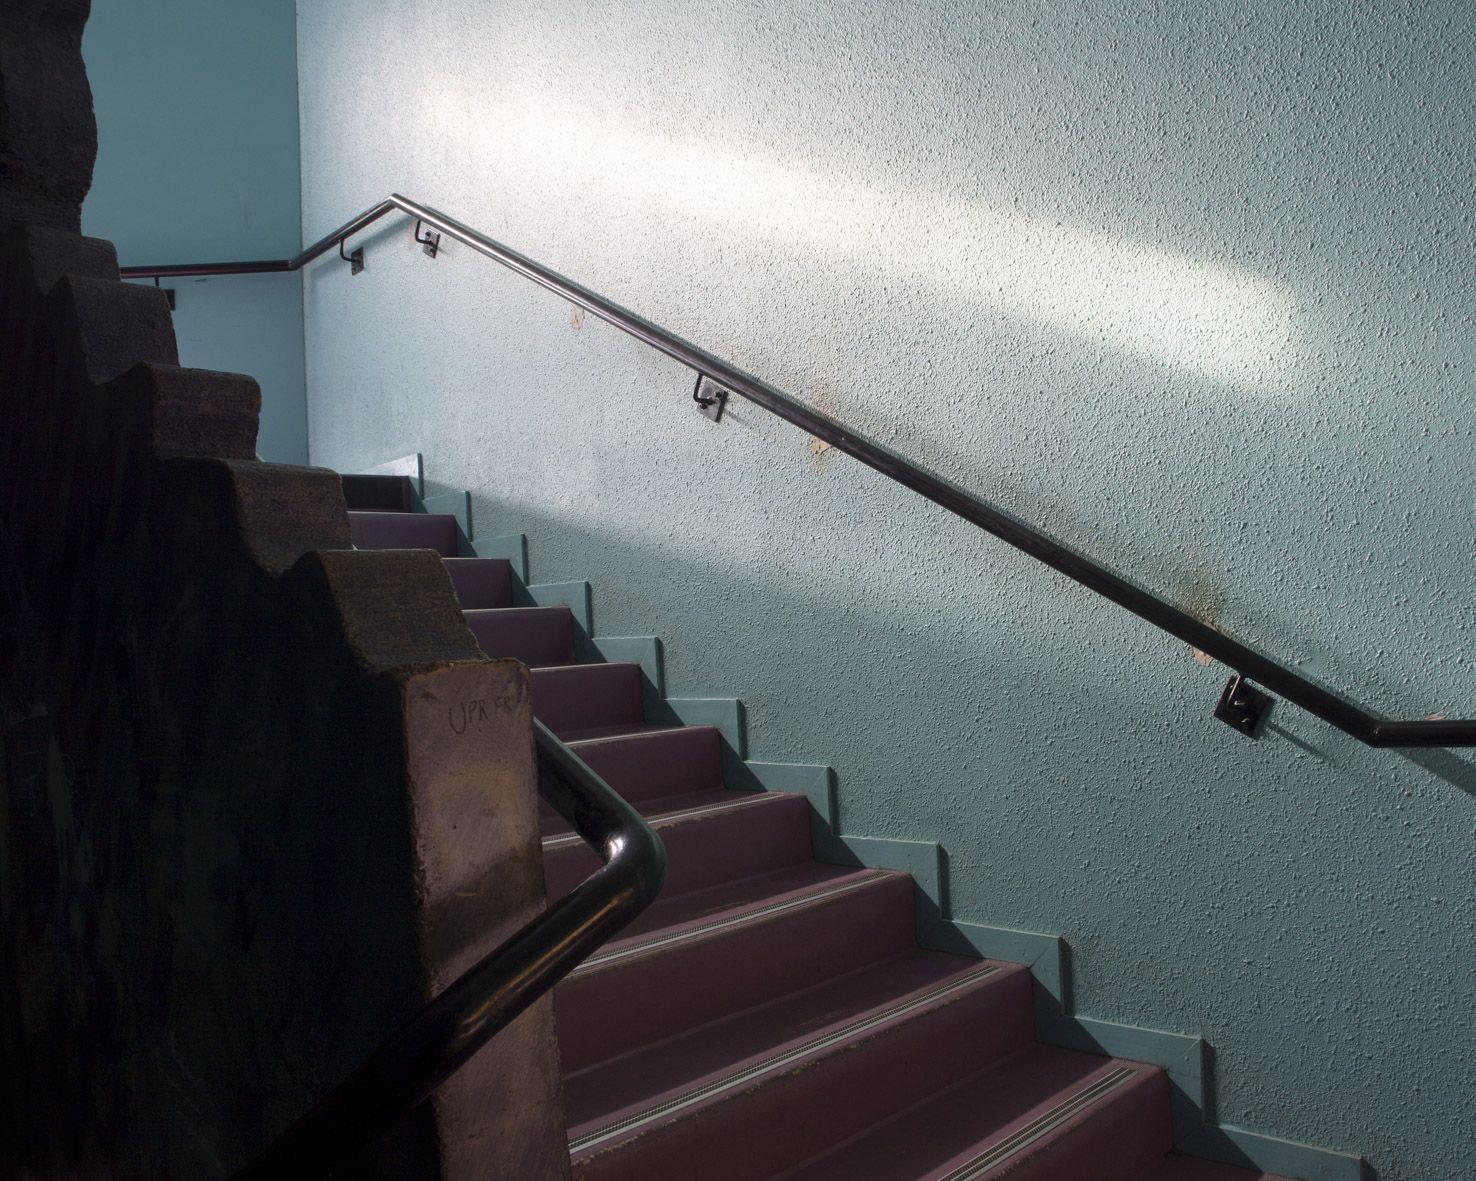 m.dearing-la-10-l-escalier-du-lycee-08867a3b58ffd343a1a2737d50657dd0